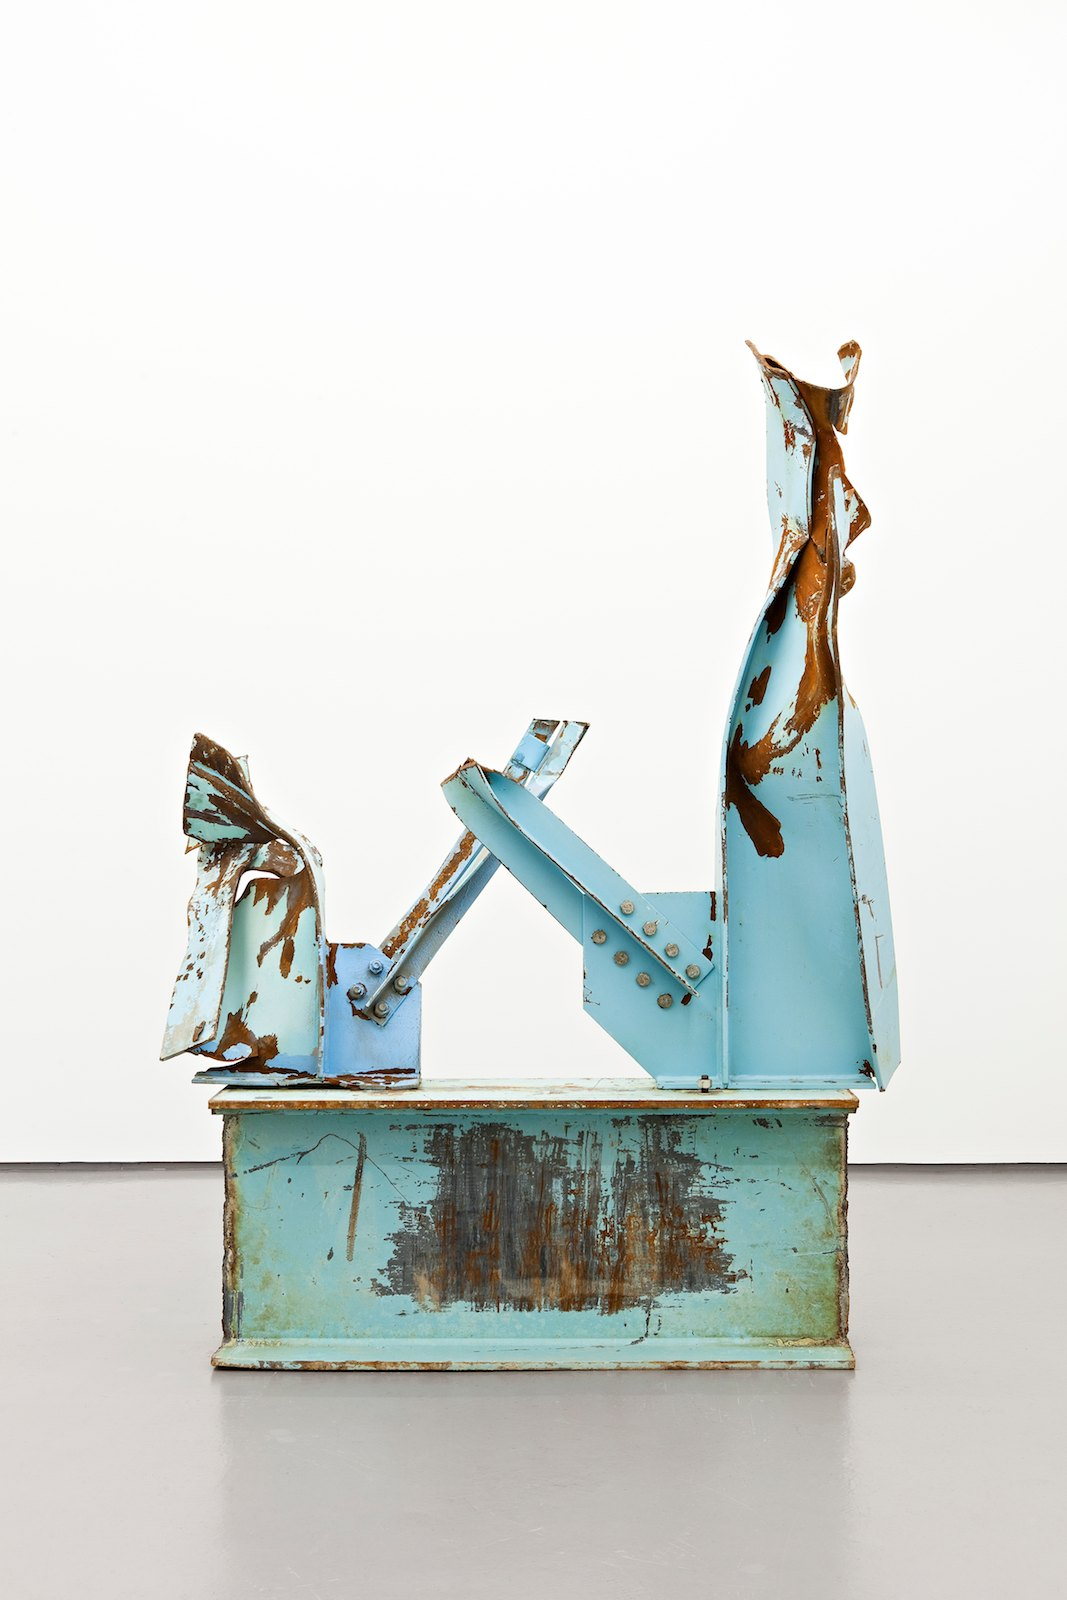 Miramichi 18, 2010, steel, 246 x 180 x 75 cm